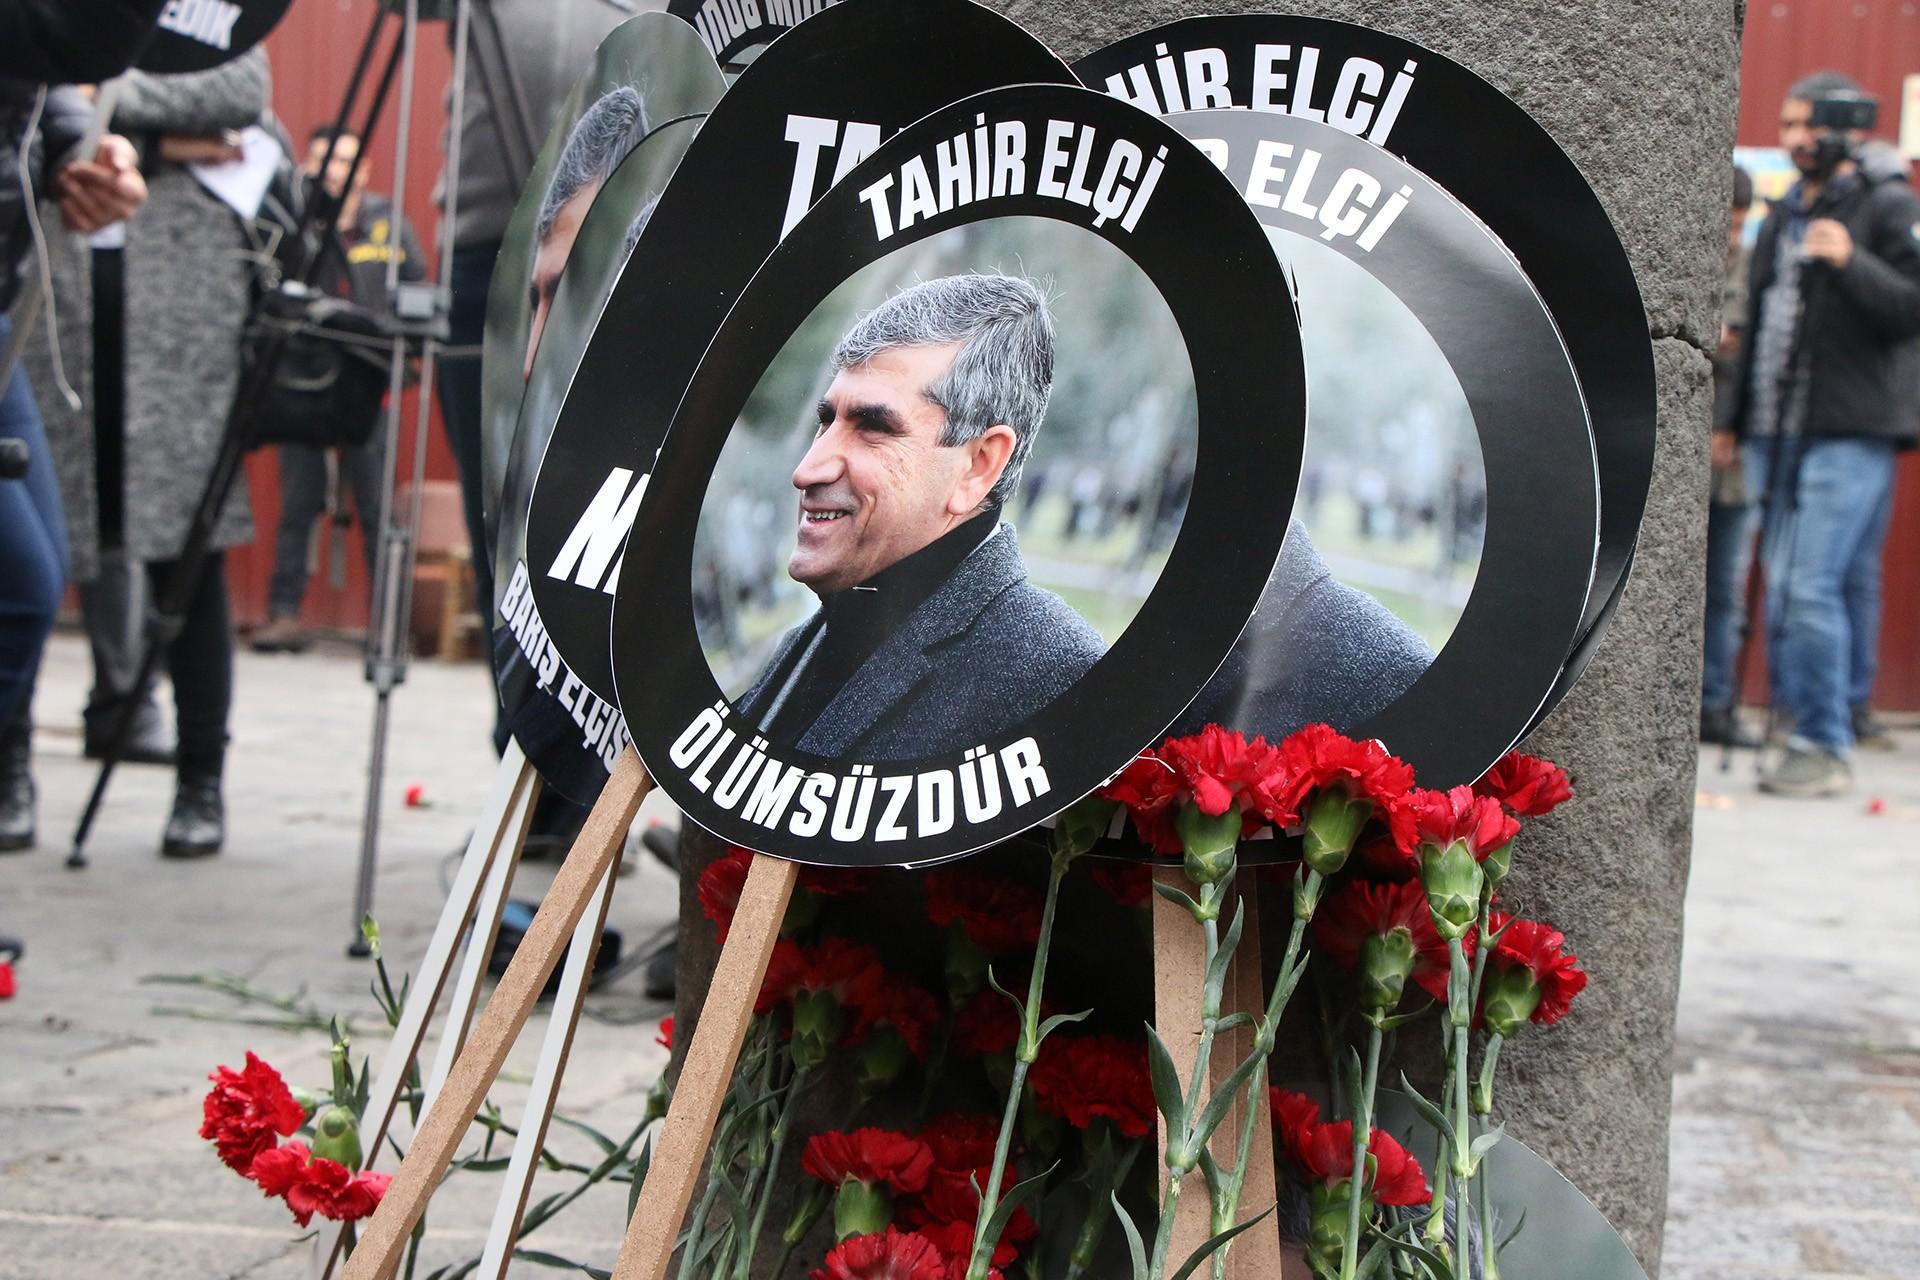 Diyarbakır Barosu Başkanı Tahir Elçi